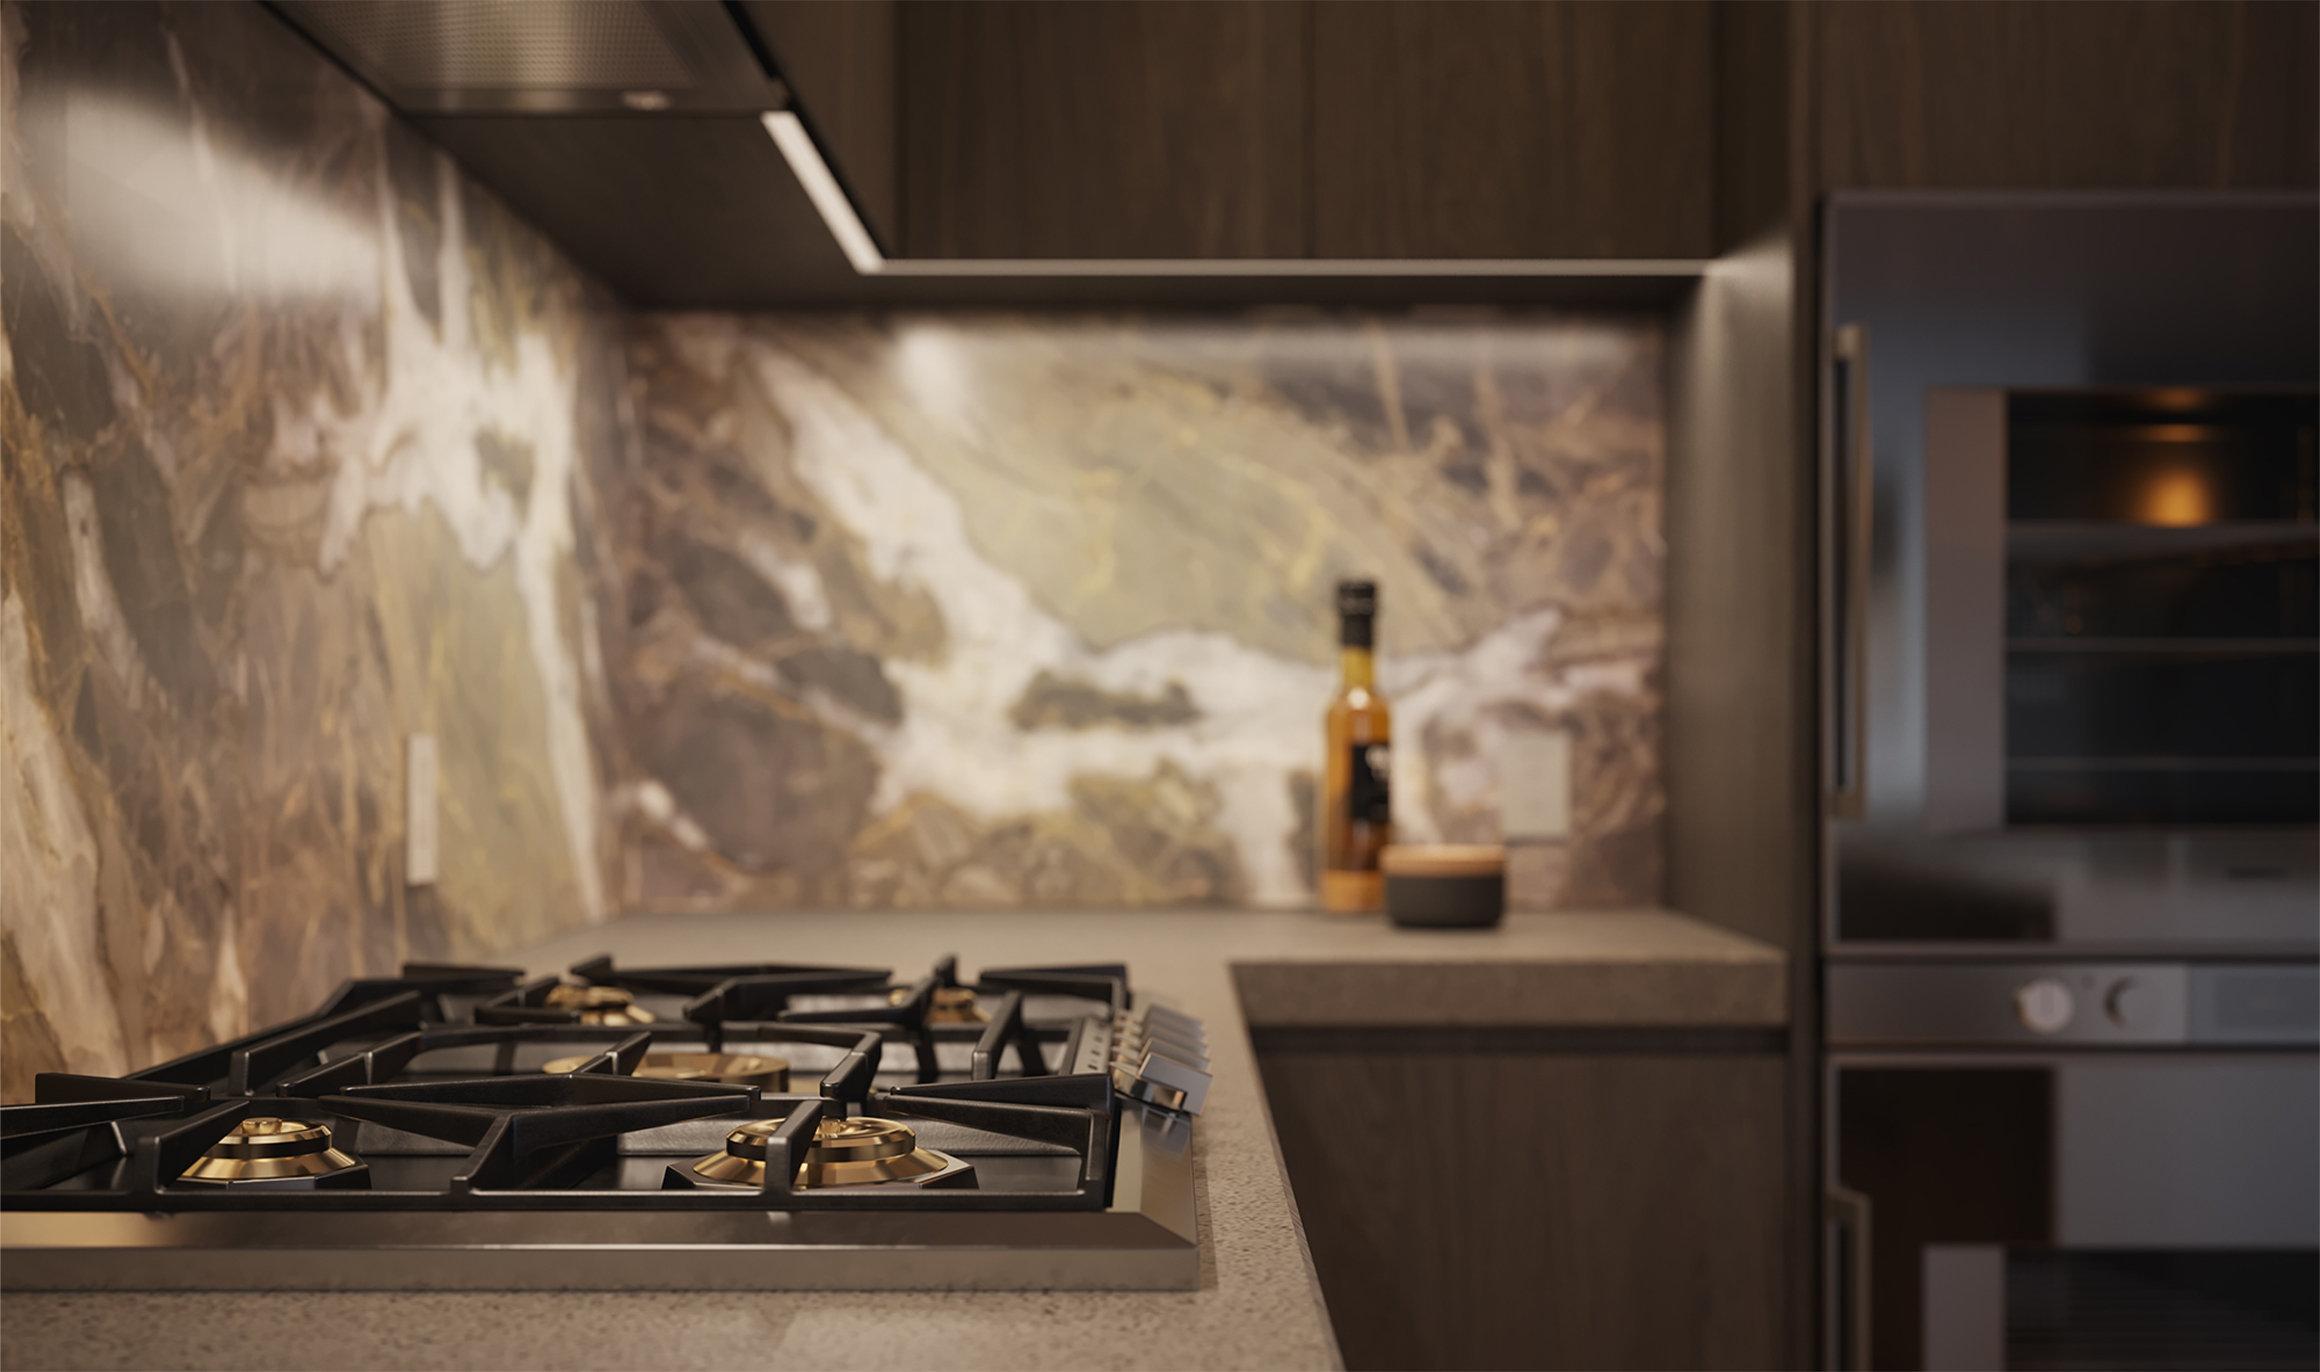 Tesoro - 1551 Quebec St - Stove/Kitchen!